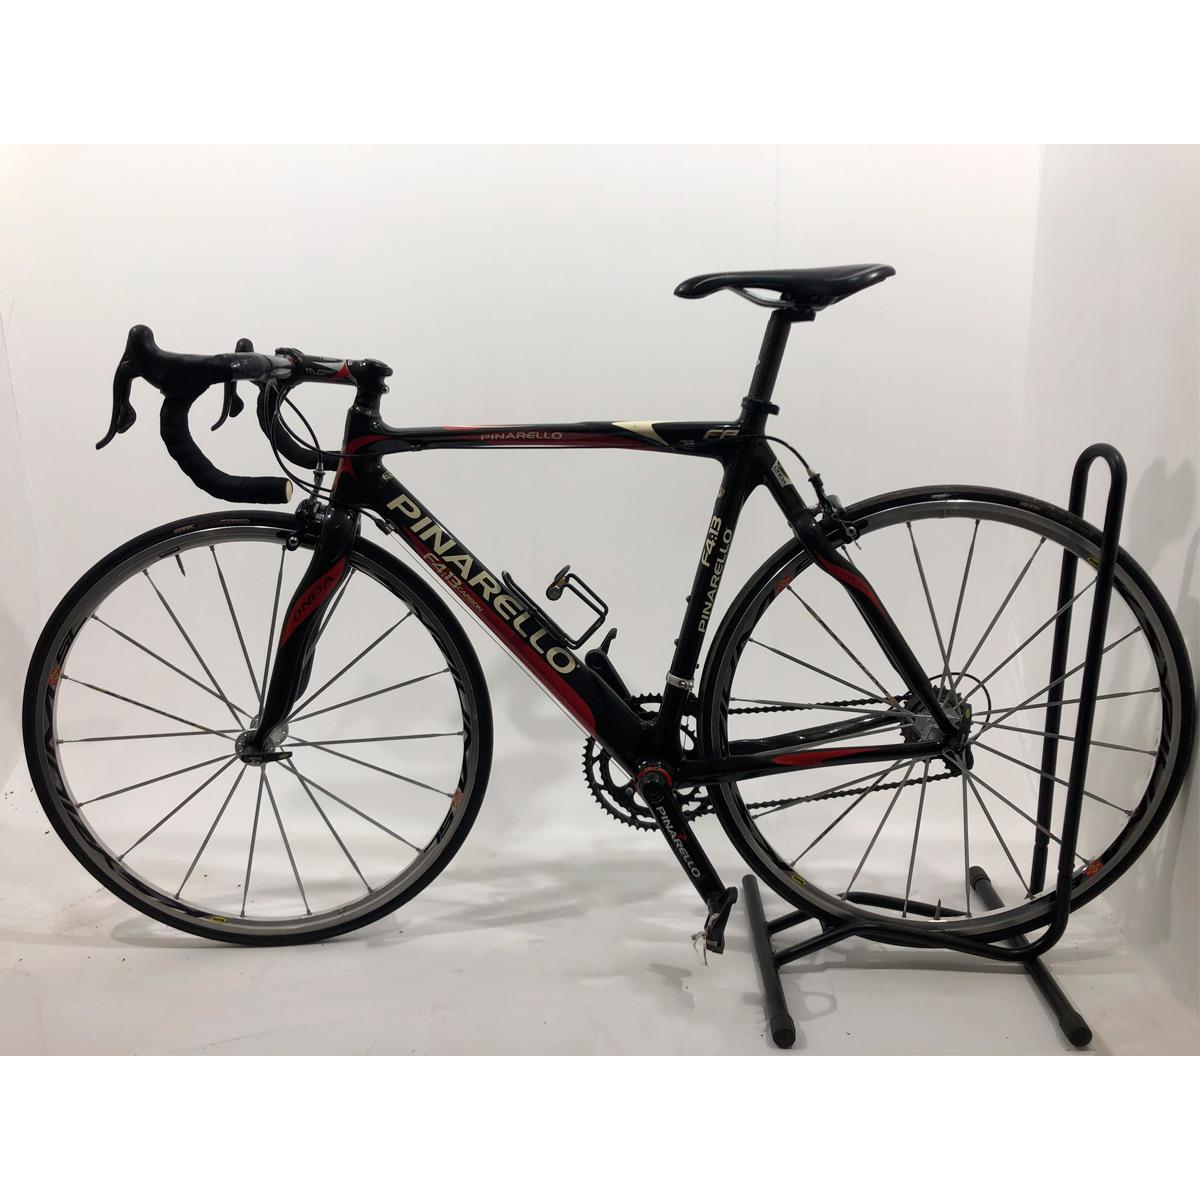 Bicicleta Pinarello F4:13 (Usada)